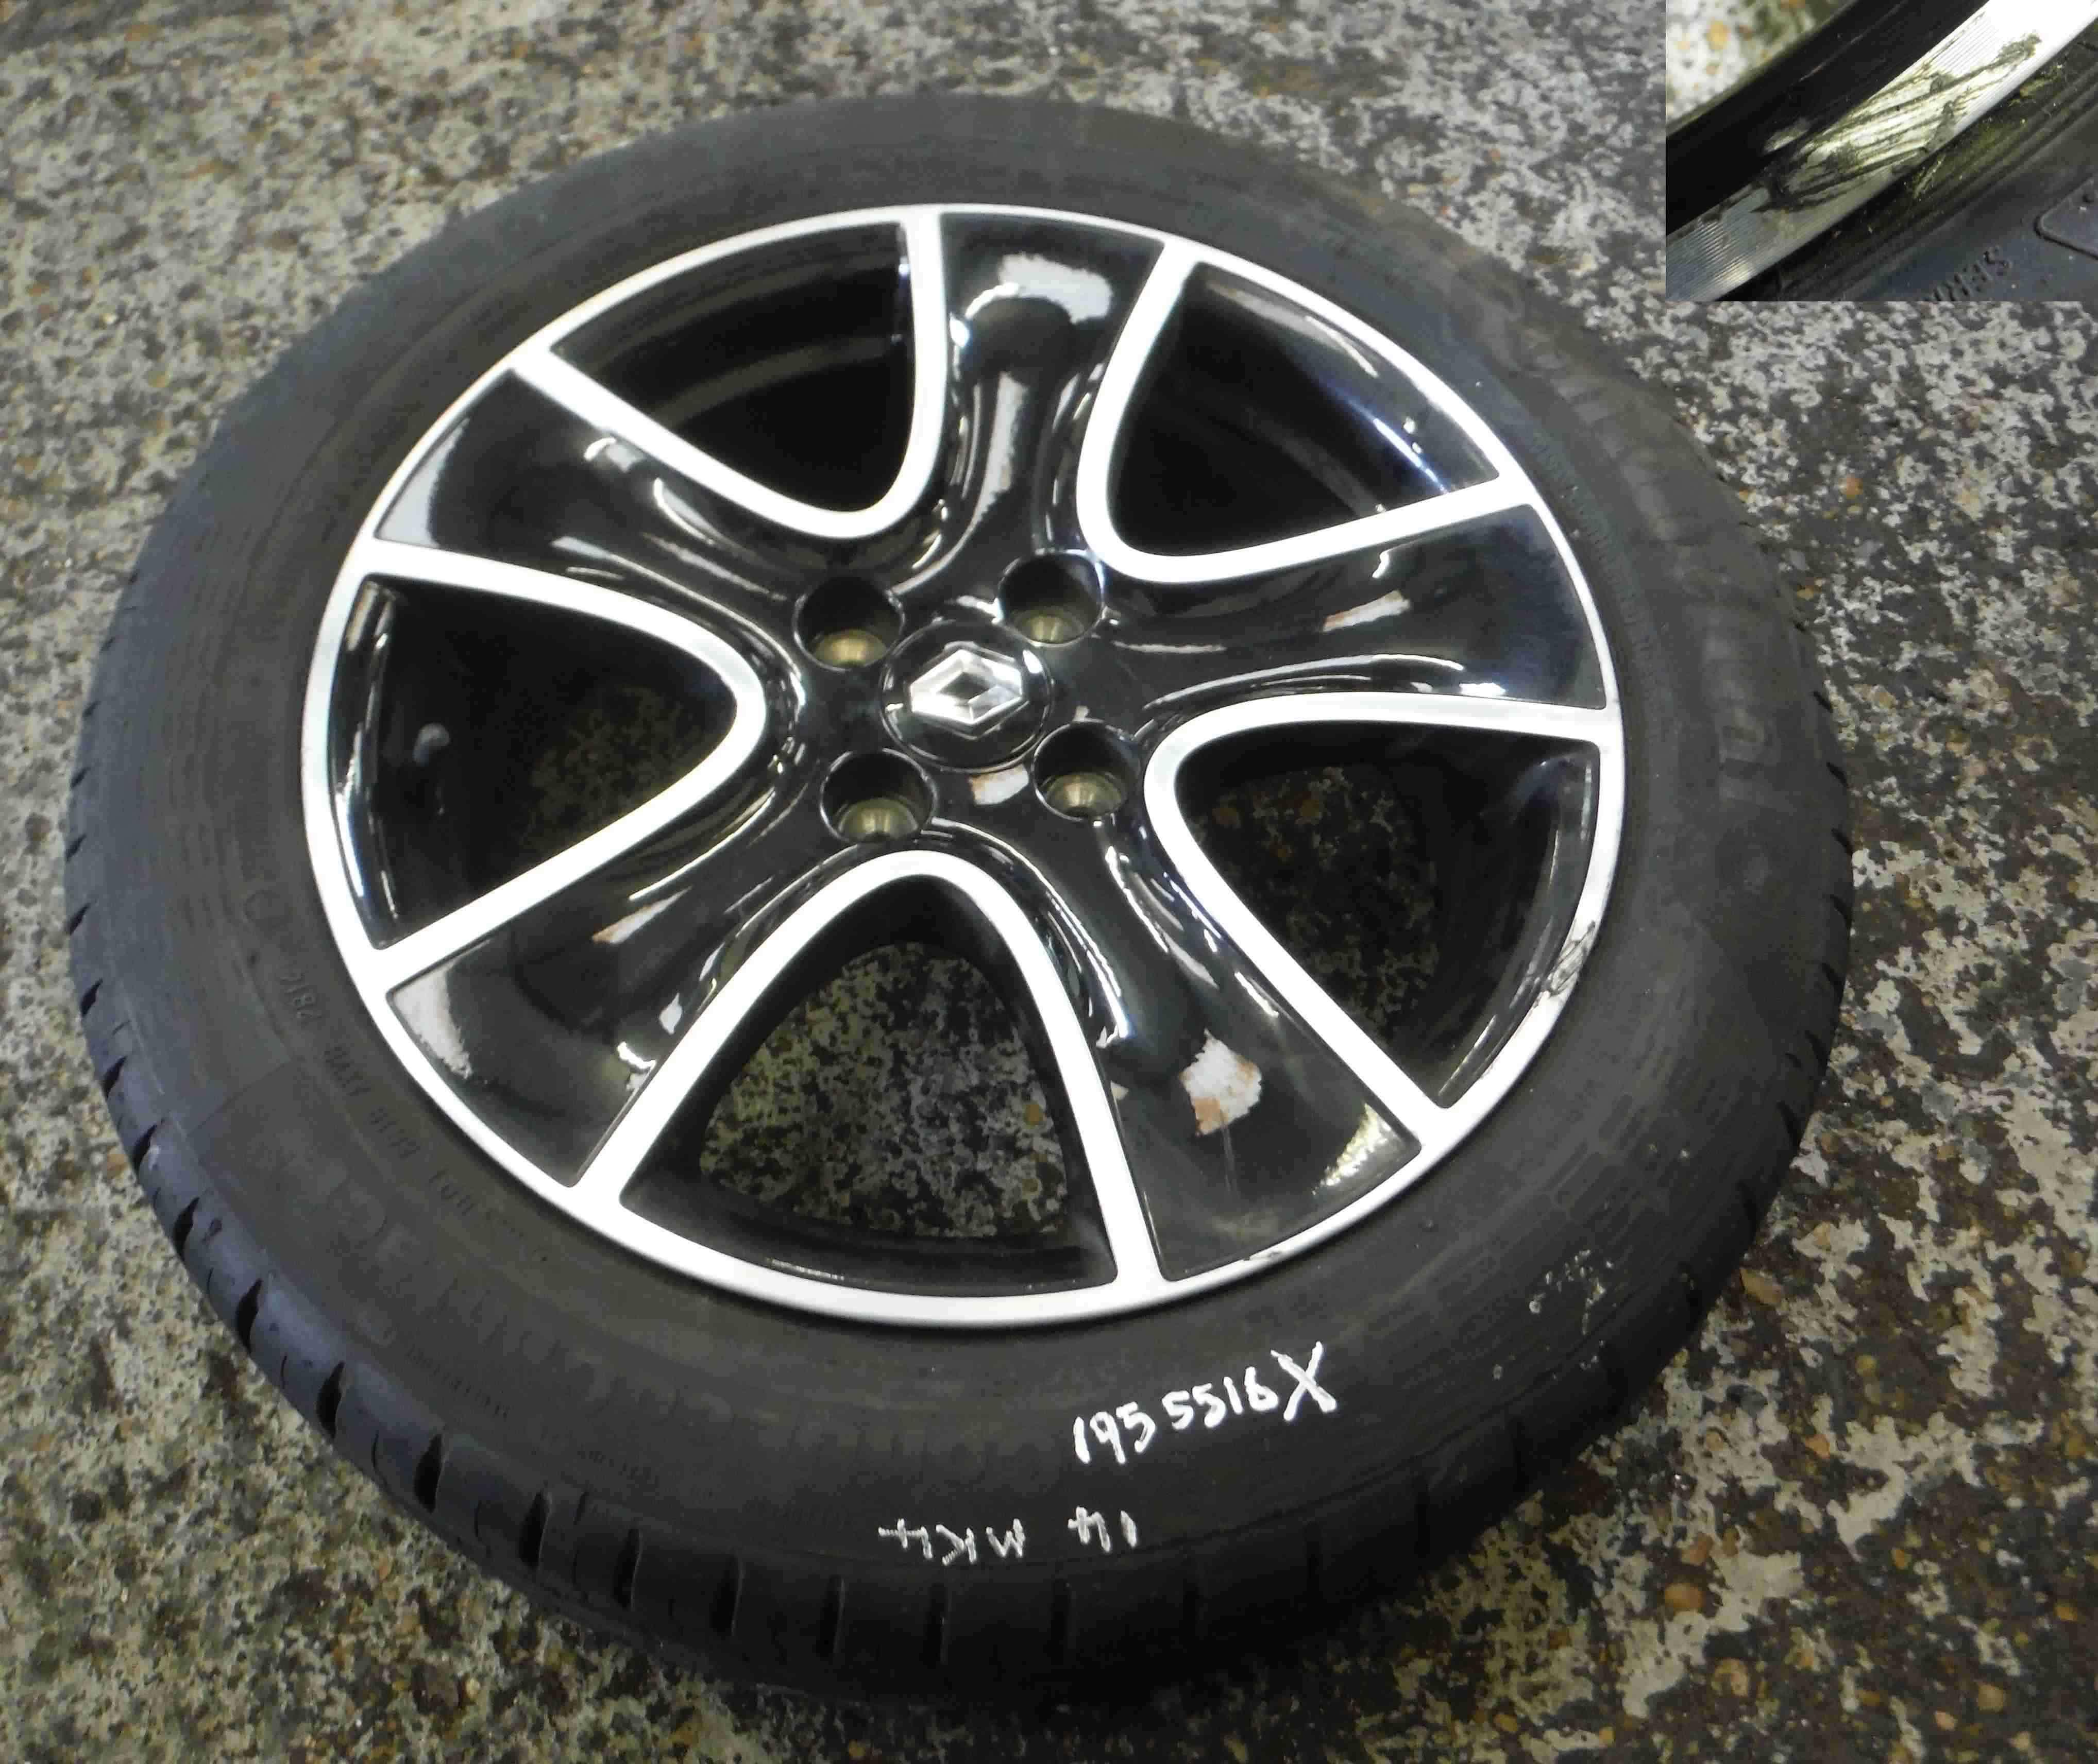 Renault Clio Black: Renault Clio MK4 2013-2015 Dynamique Passion Alloy Wheel